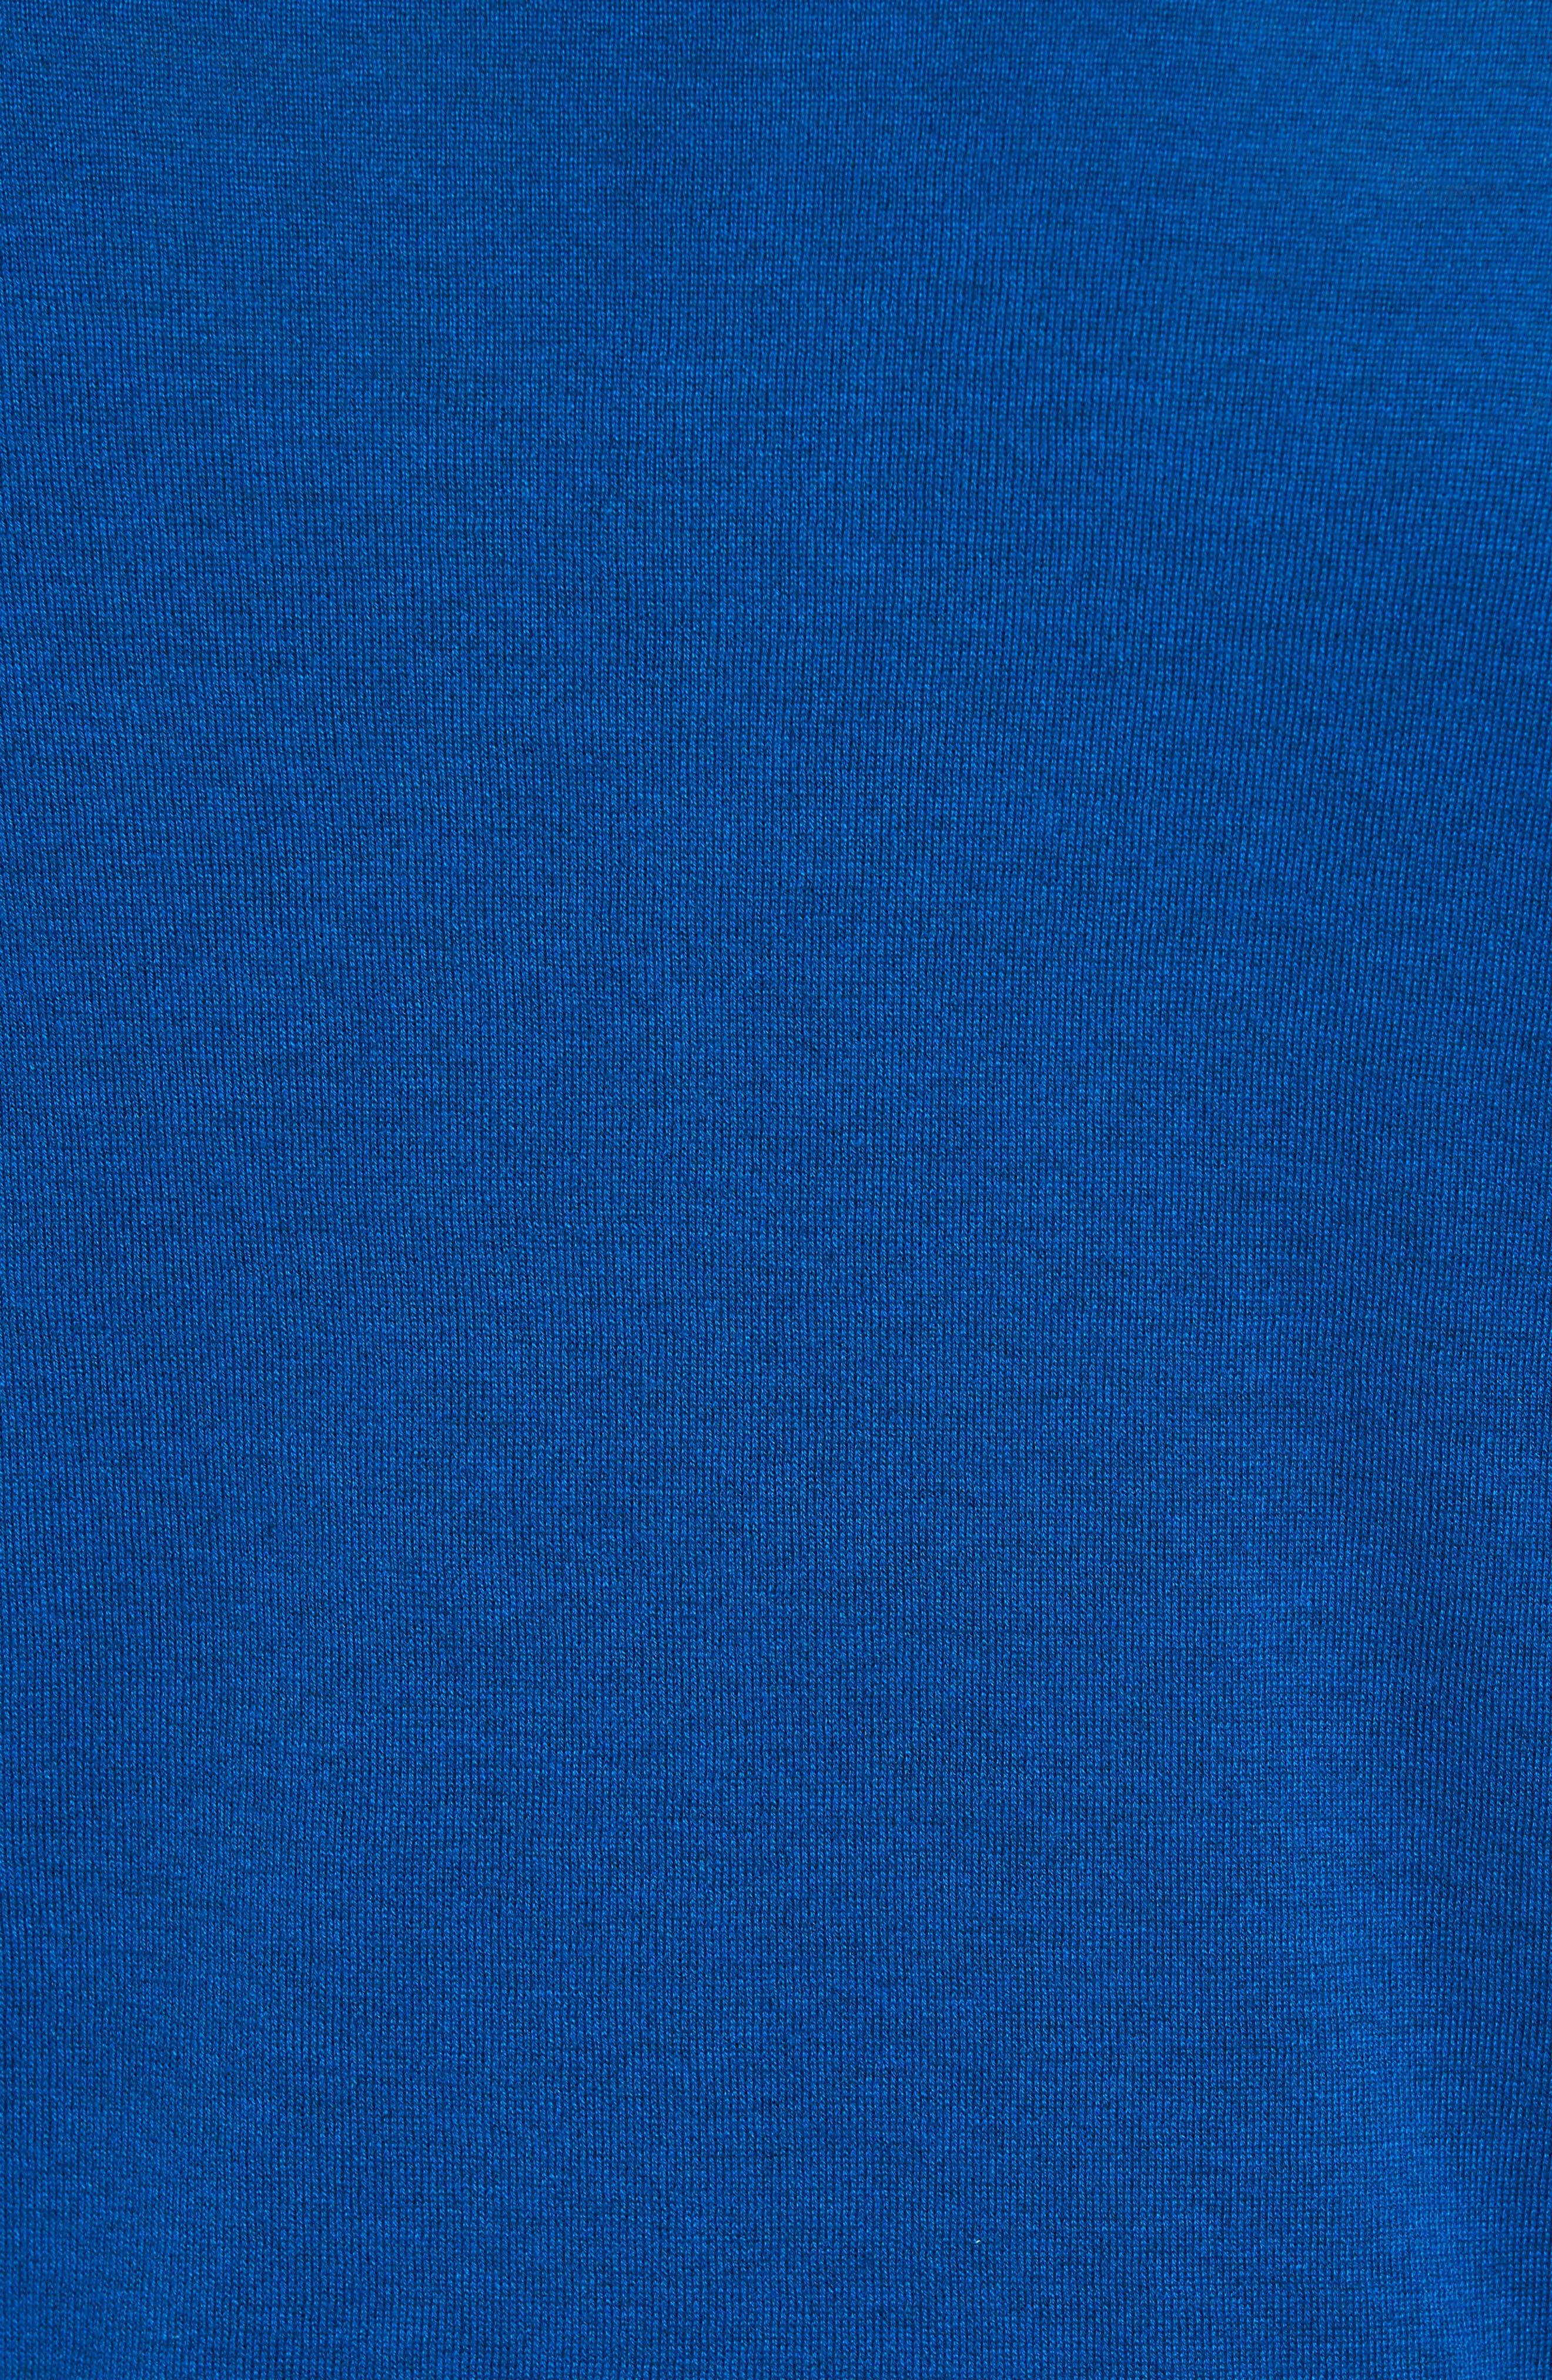 Seal Island Cotton Polo,                             Alternate thumbnail 5, color,                             Stevens Blue